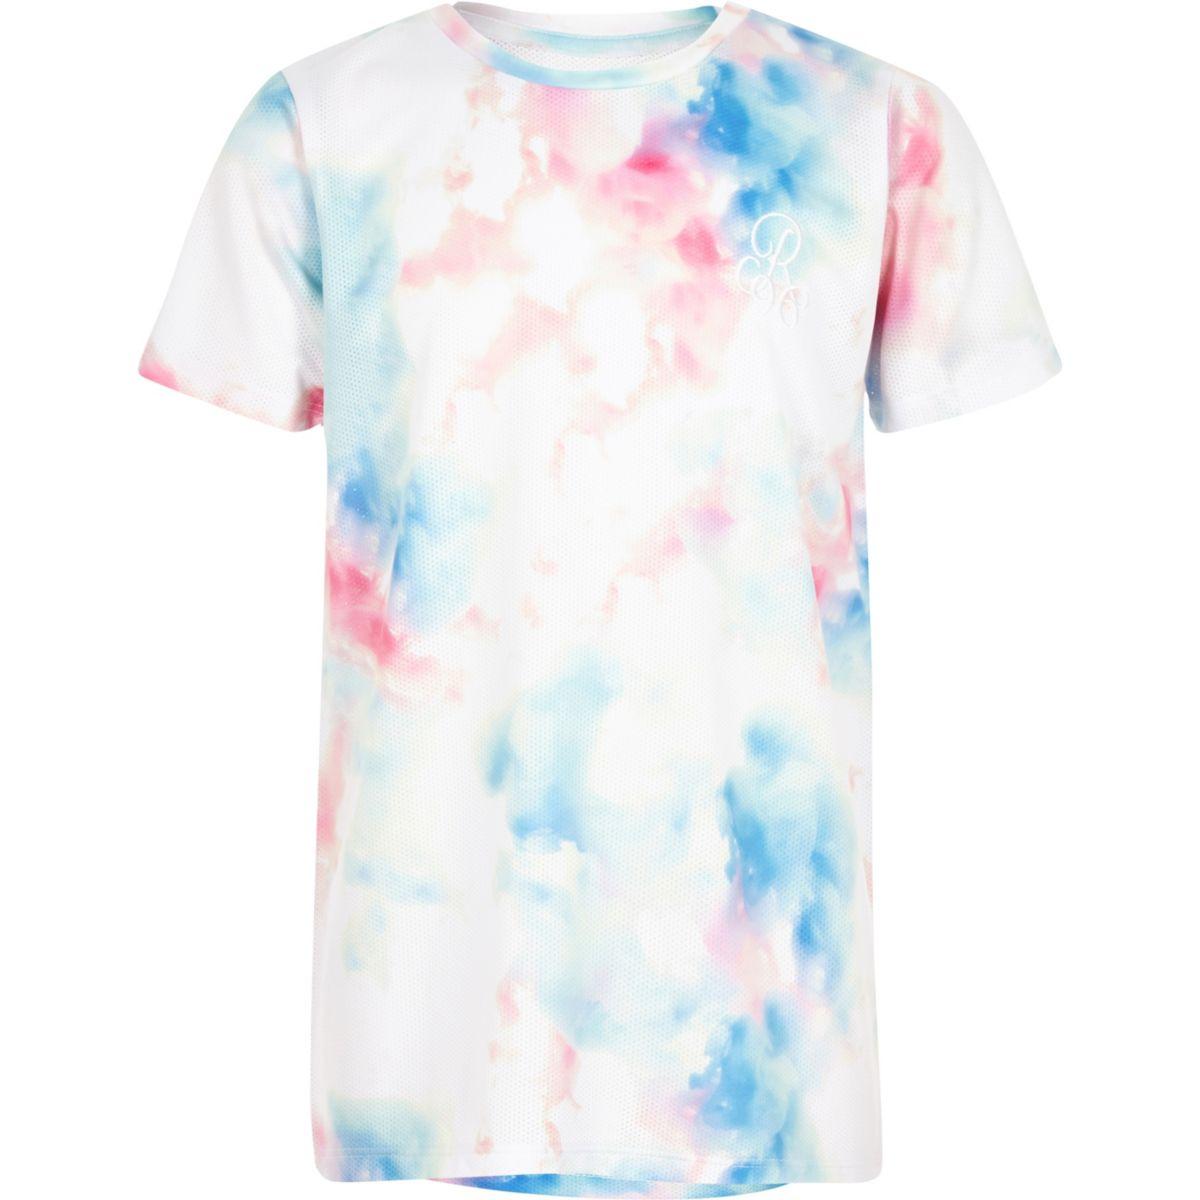 Boys white pastel mesh T-shirt